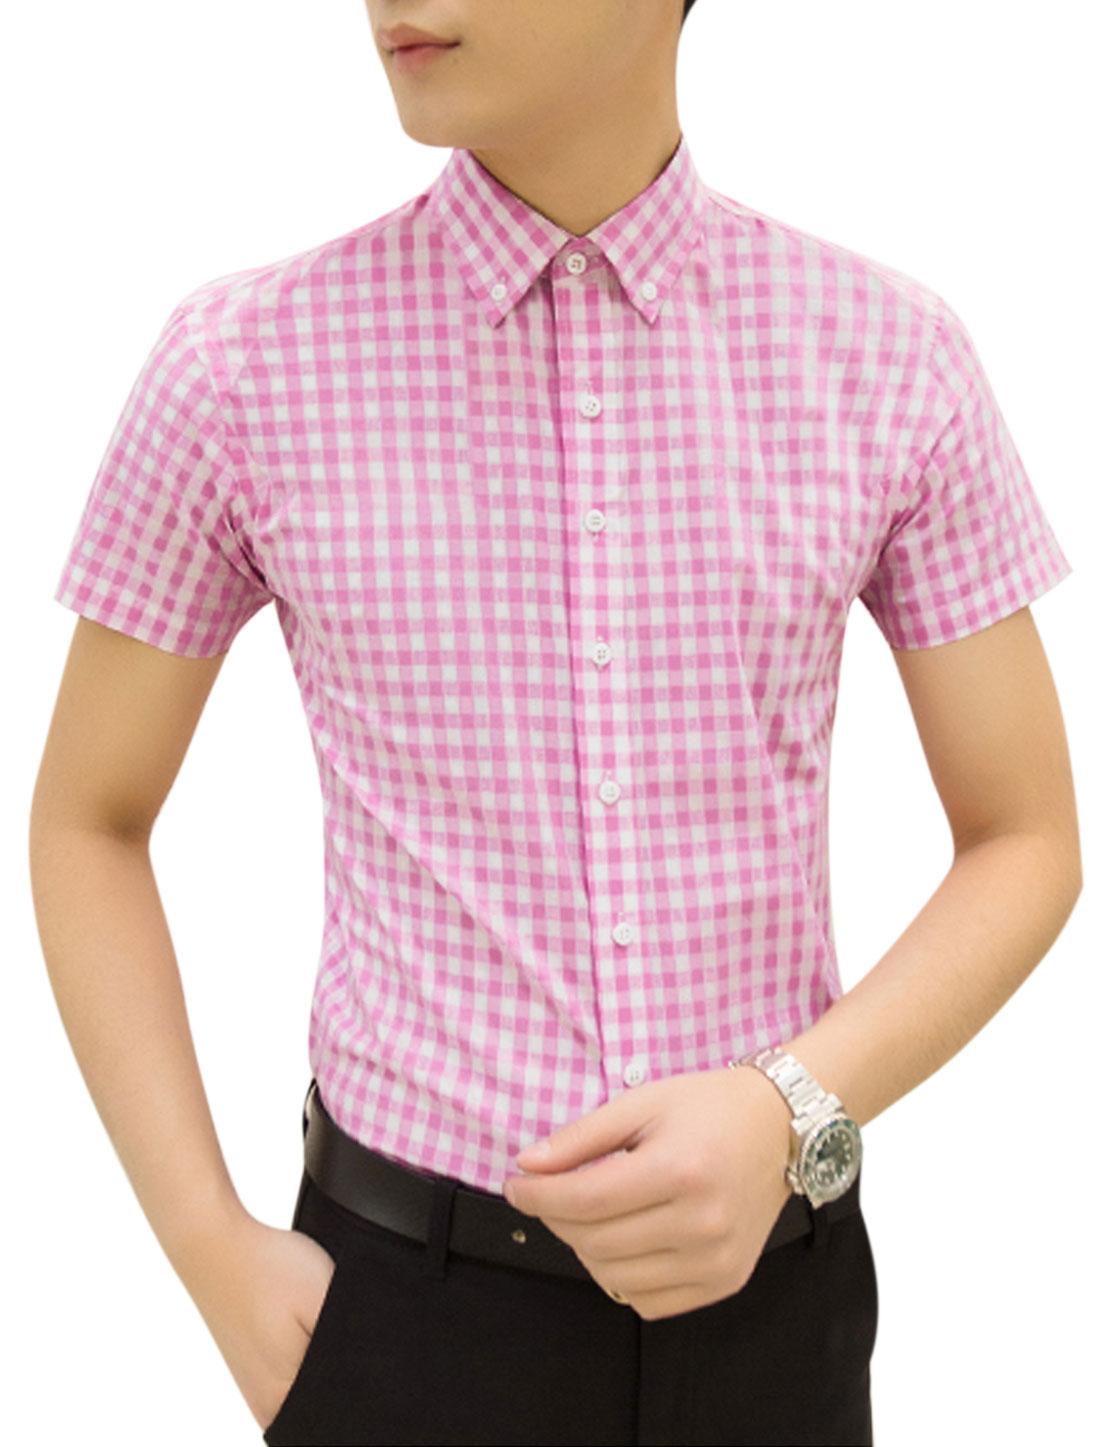 Man Checks Short Sleeves Button Down Point Collar Casual Shirt Pink White M